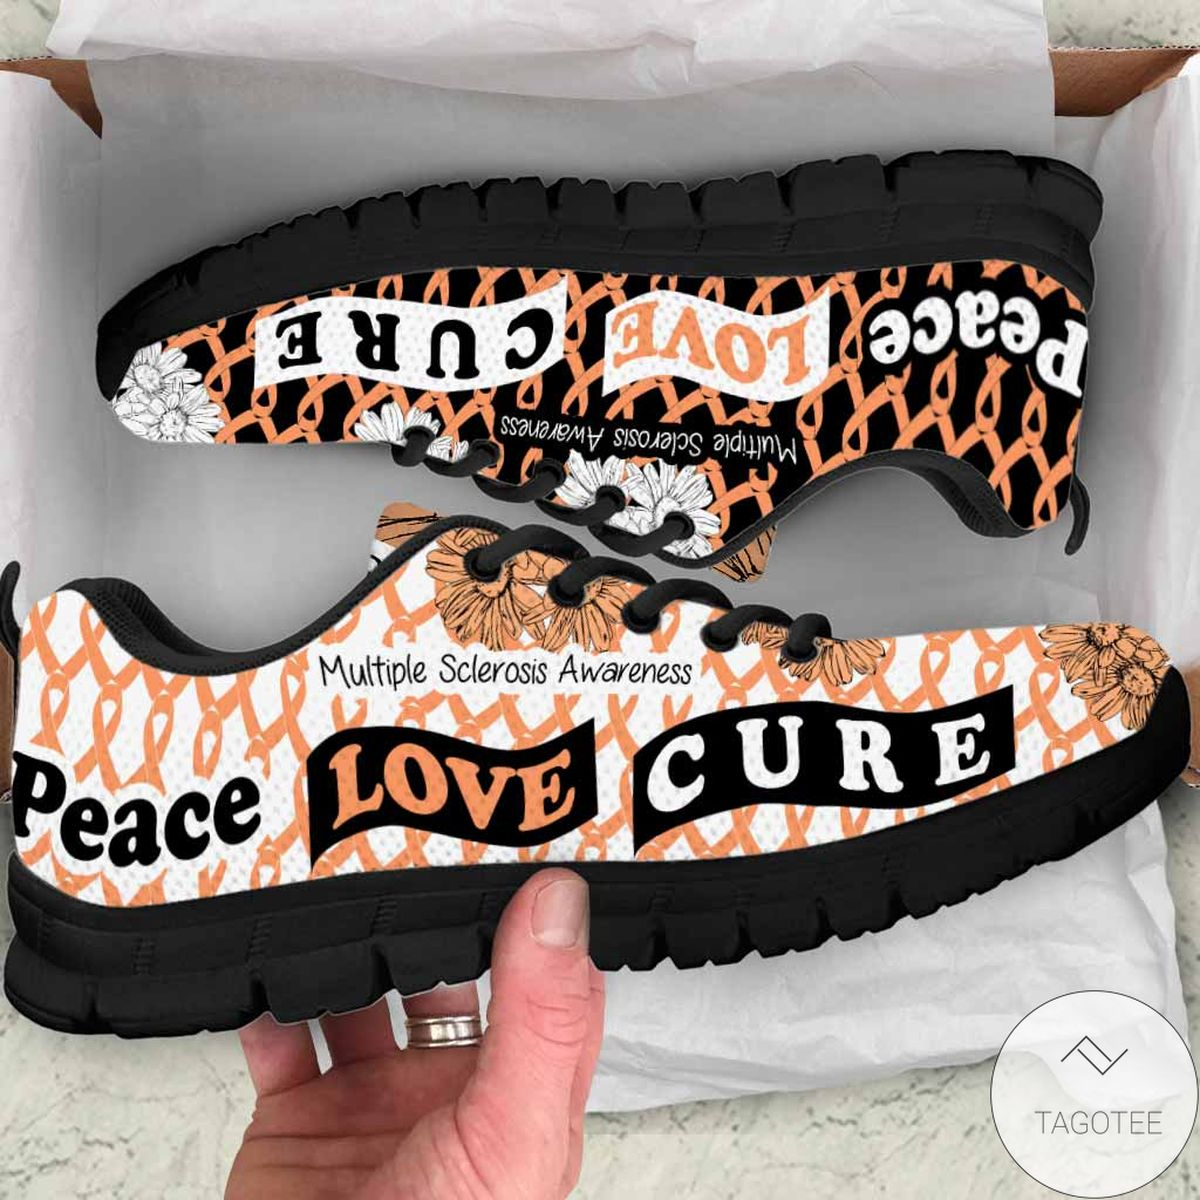 Peace Love Cure Multiple Sclerosis Awareness Sneakers